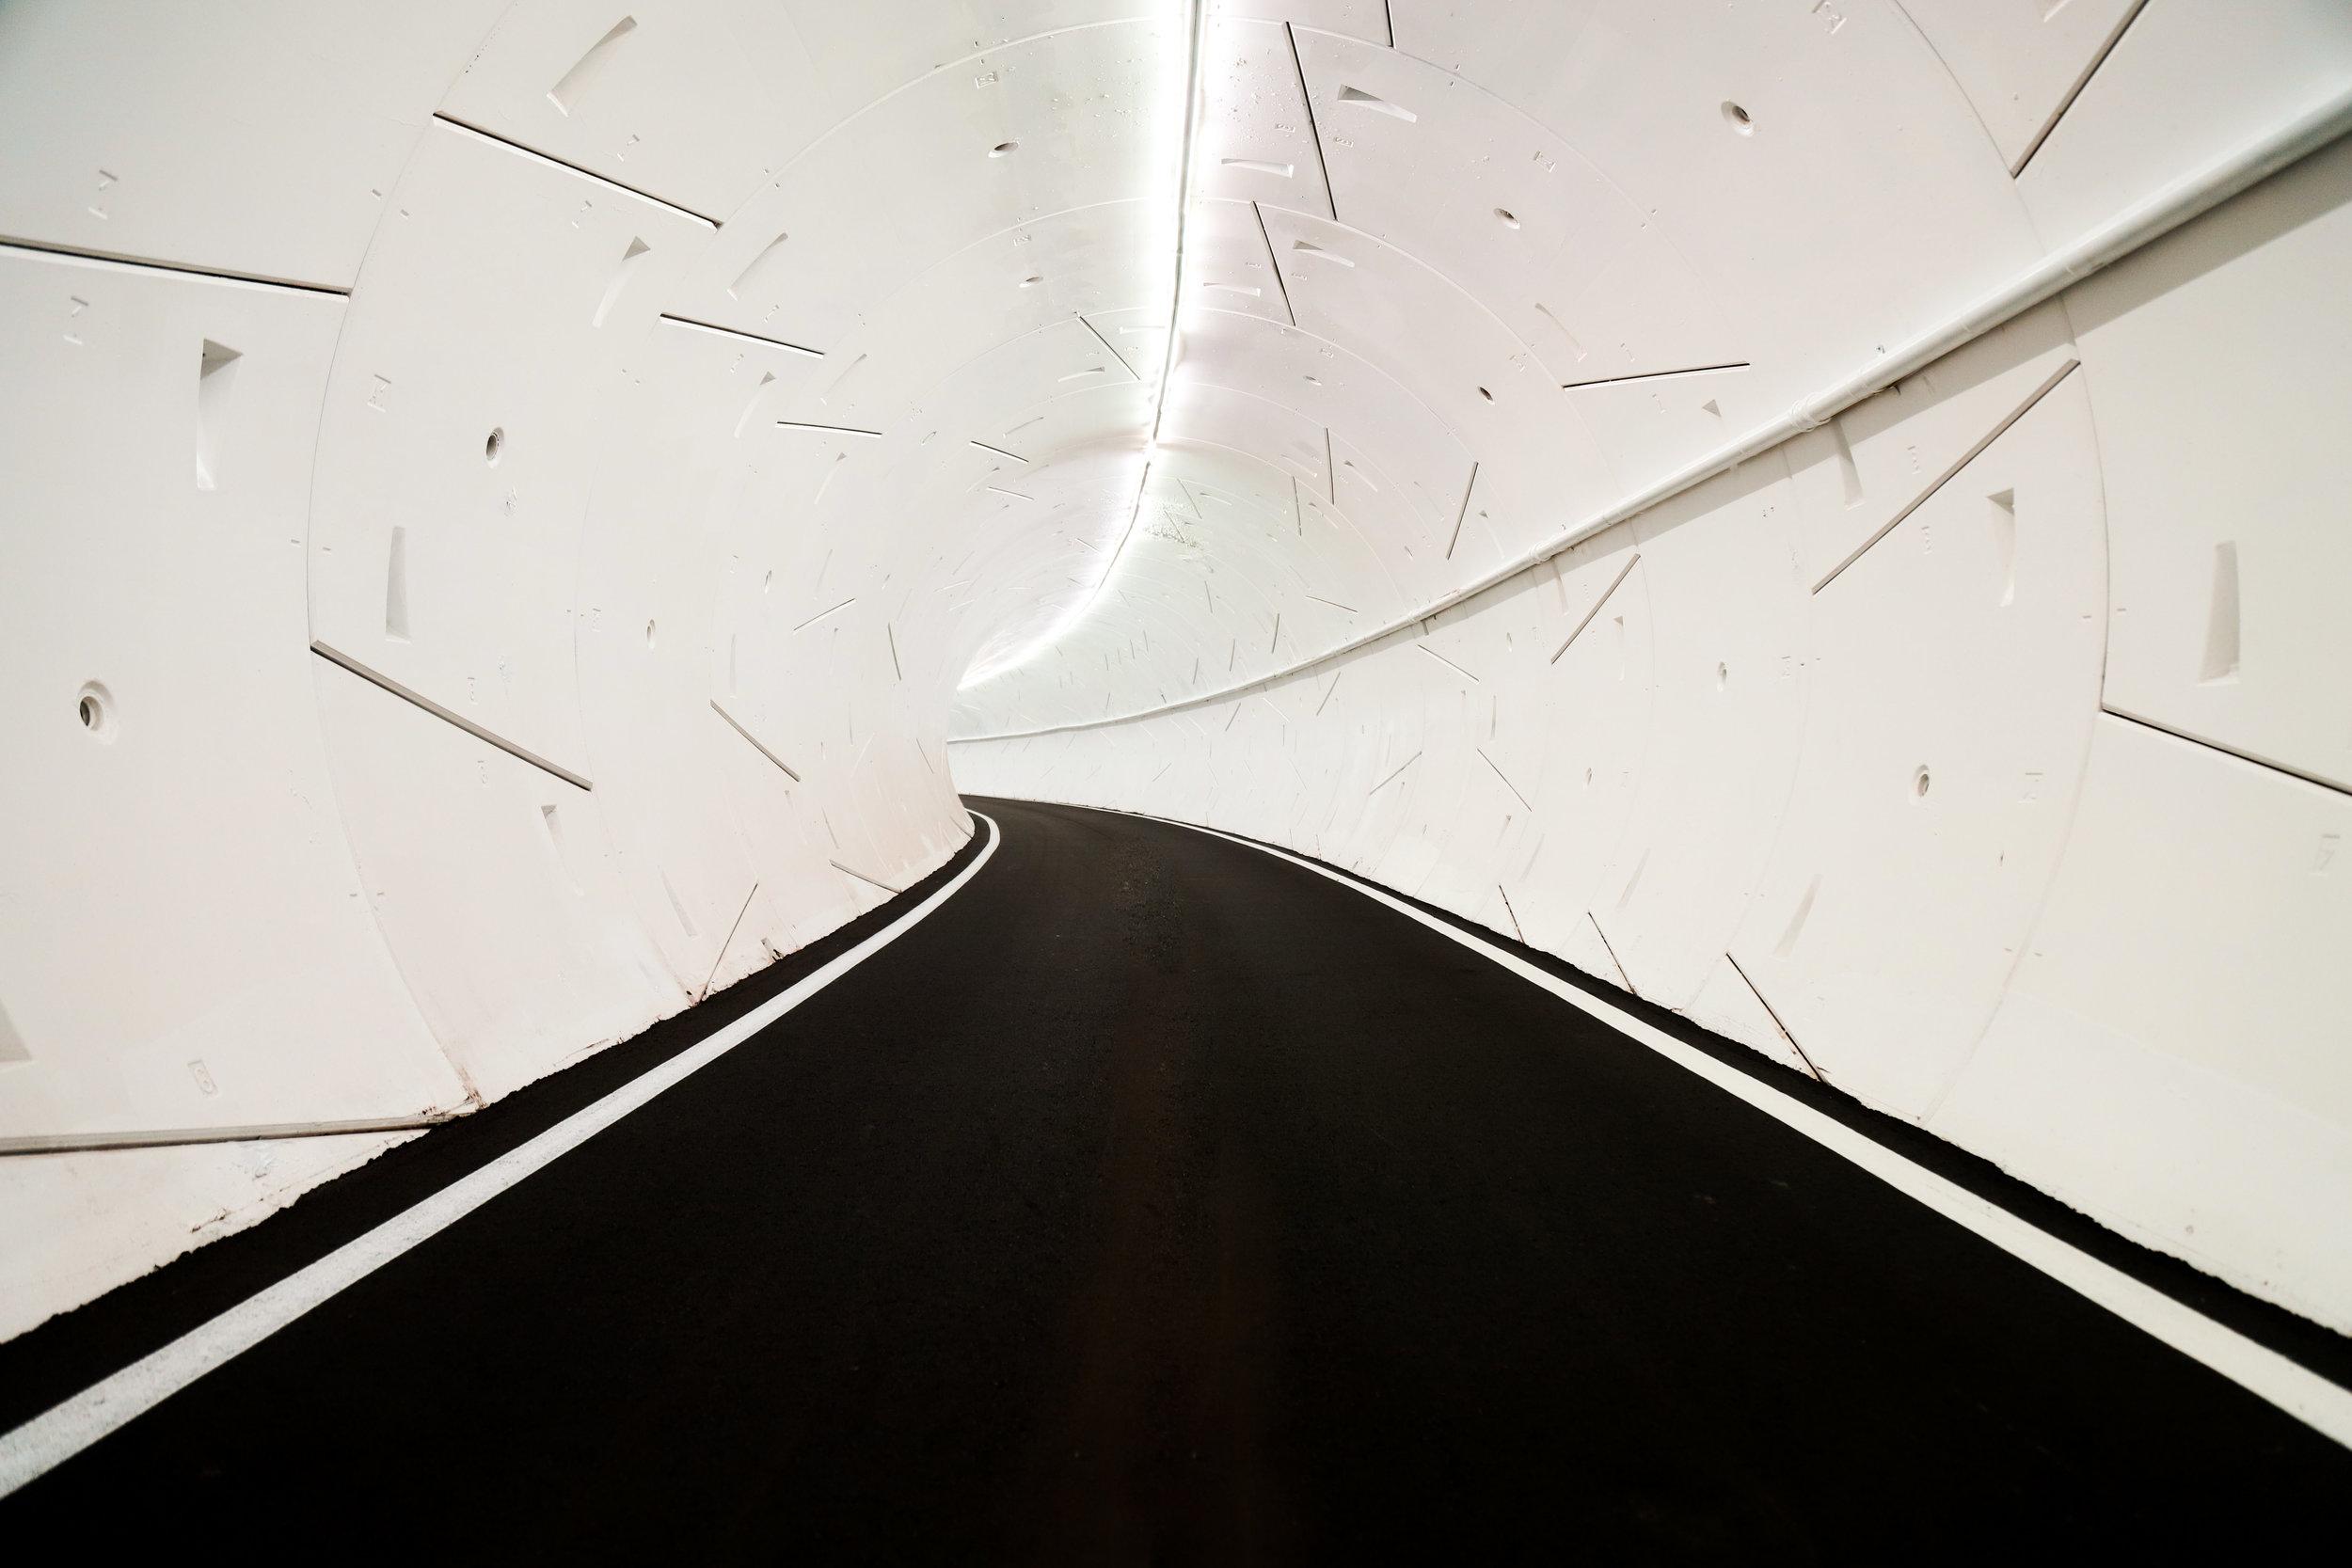 Tunnel_5.17.19.jpg